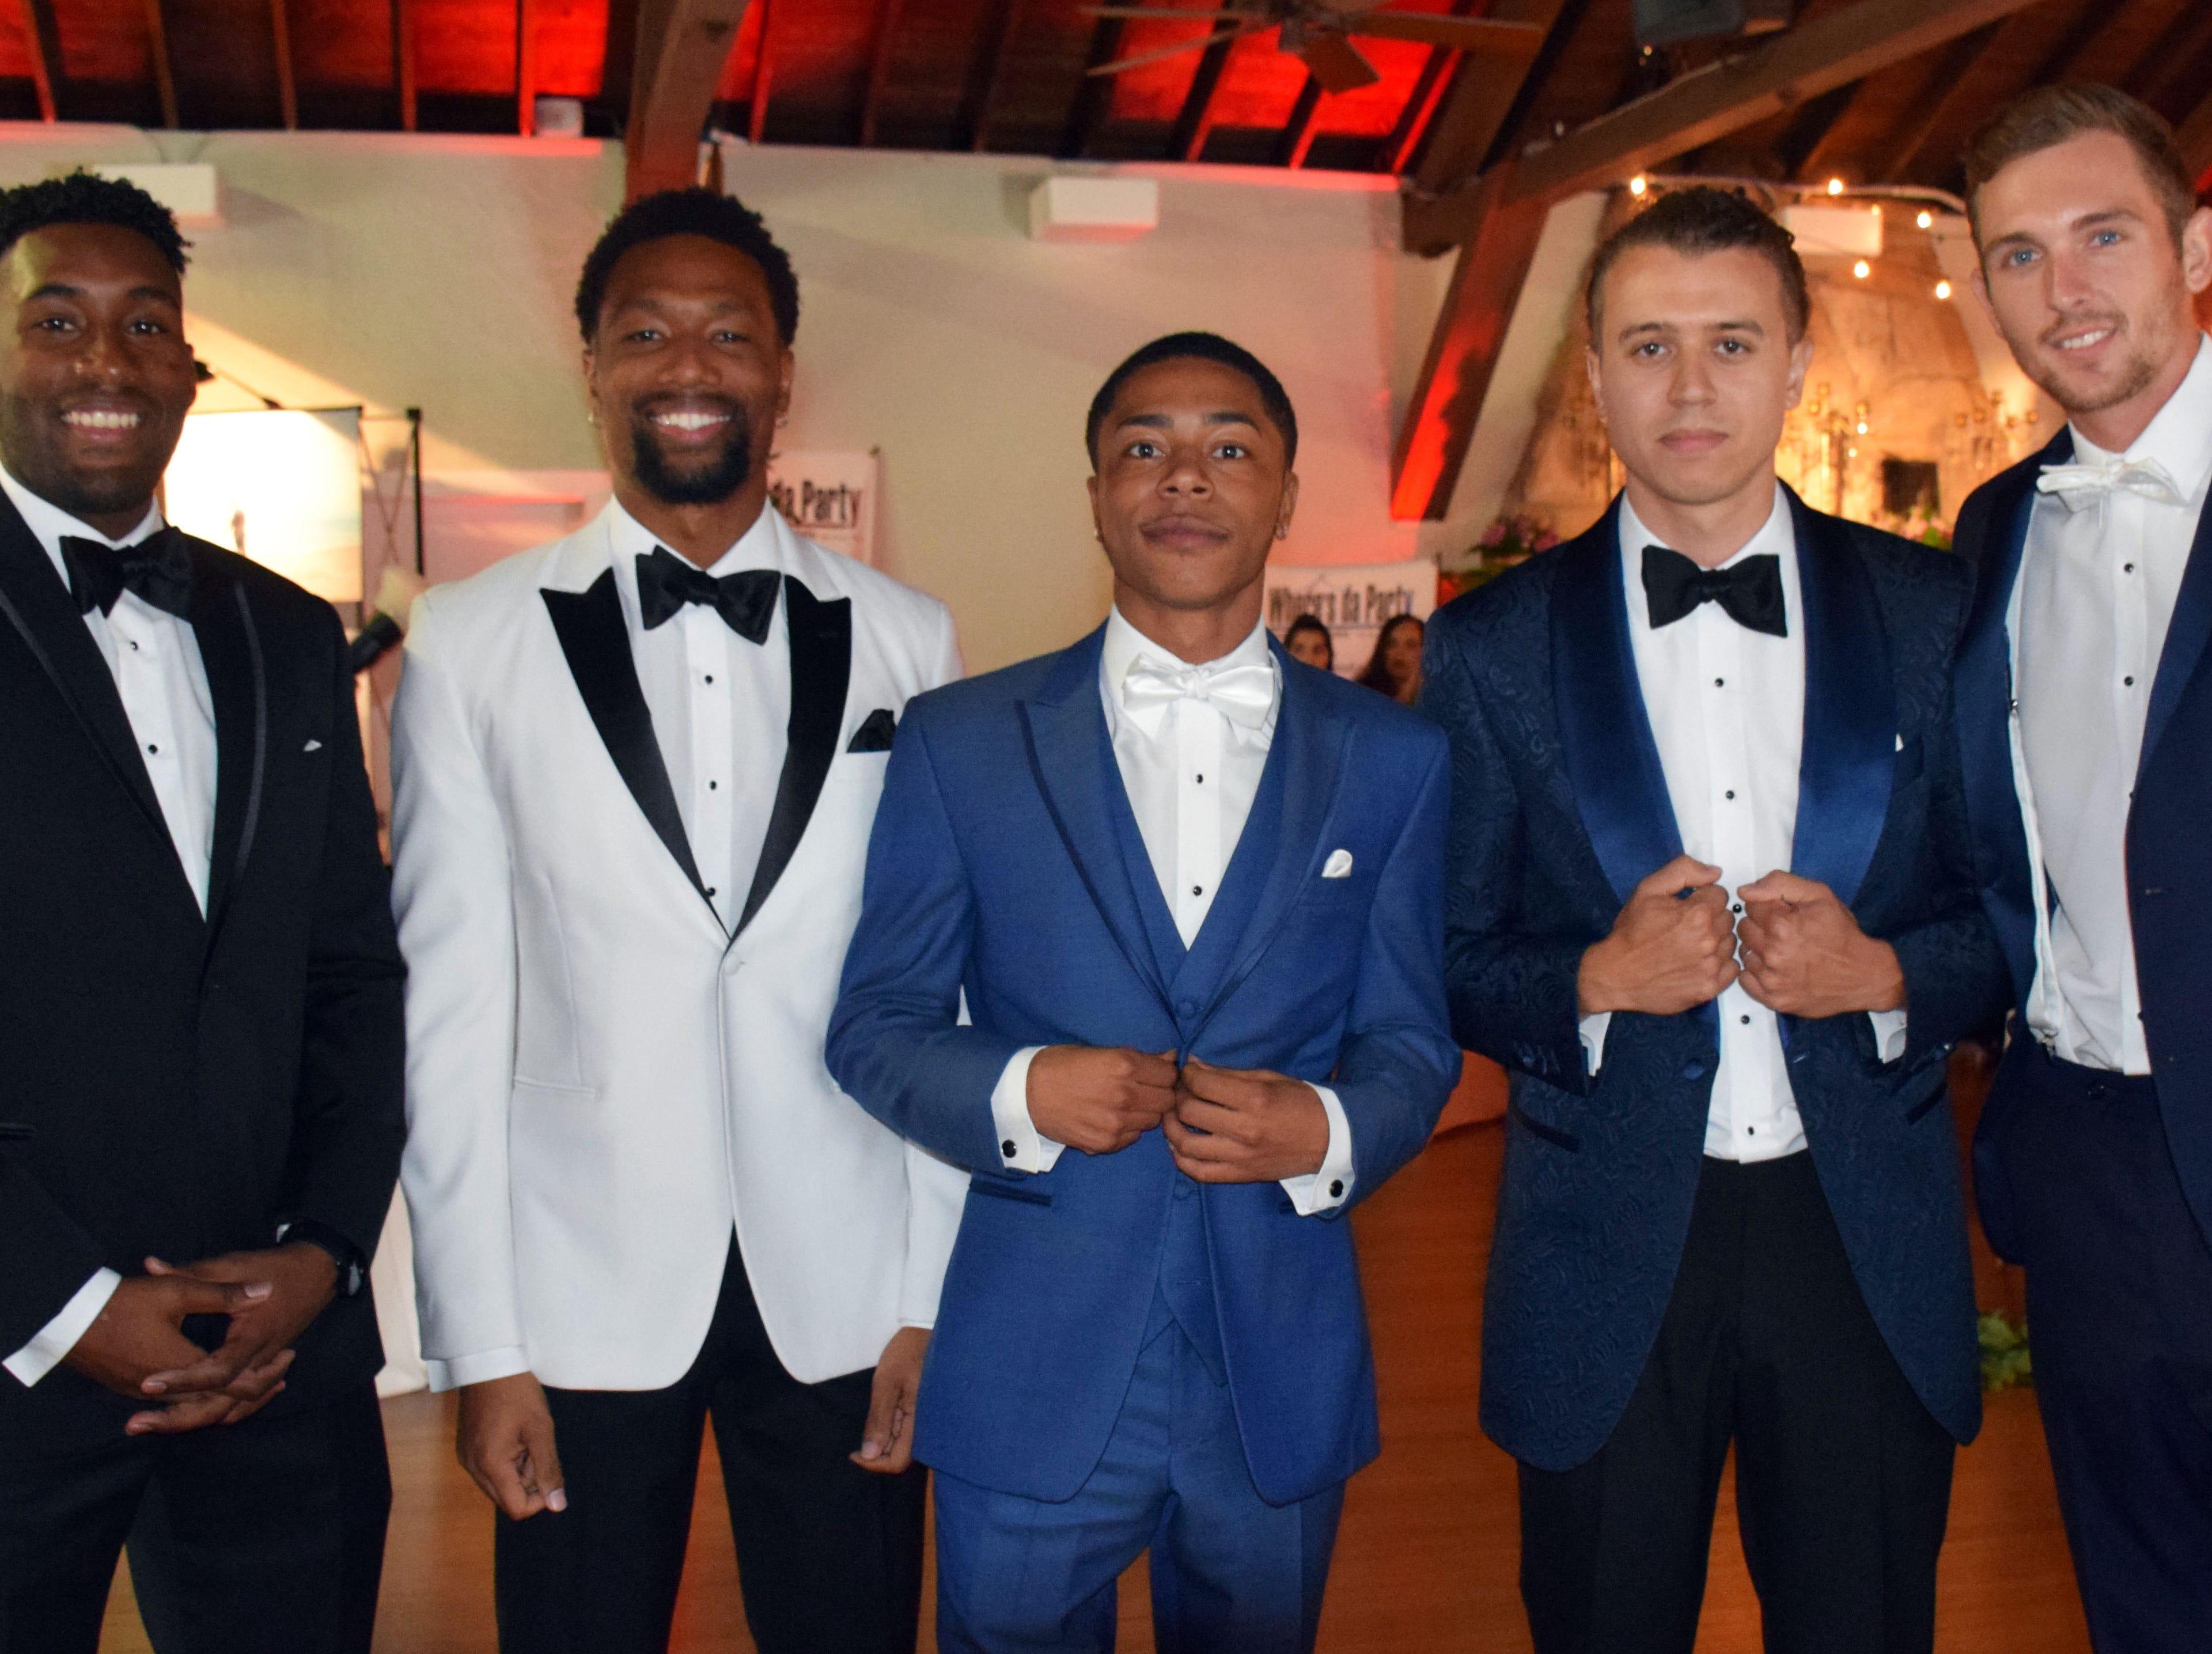 Wesley Juerakhan, Breno Nassimbeni, Earl Geter, Jahvar Jordan And Landon Chapman